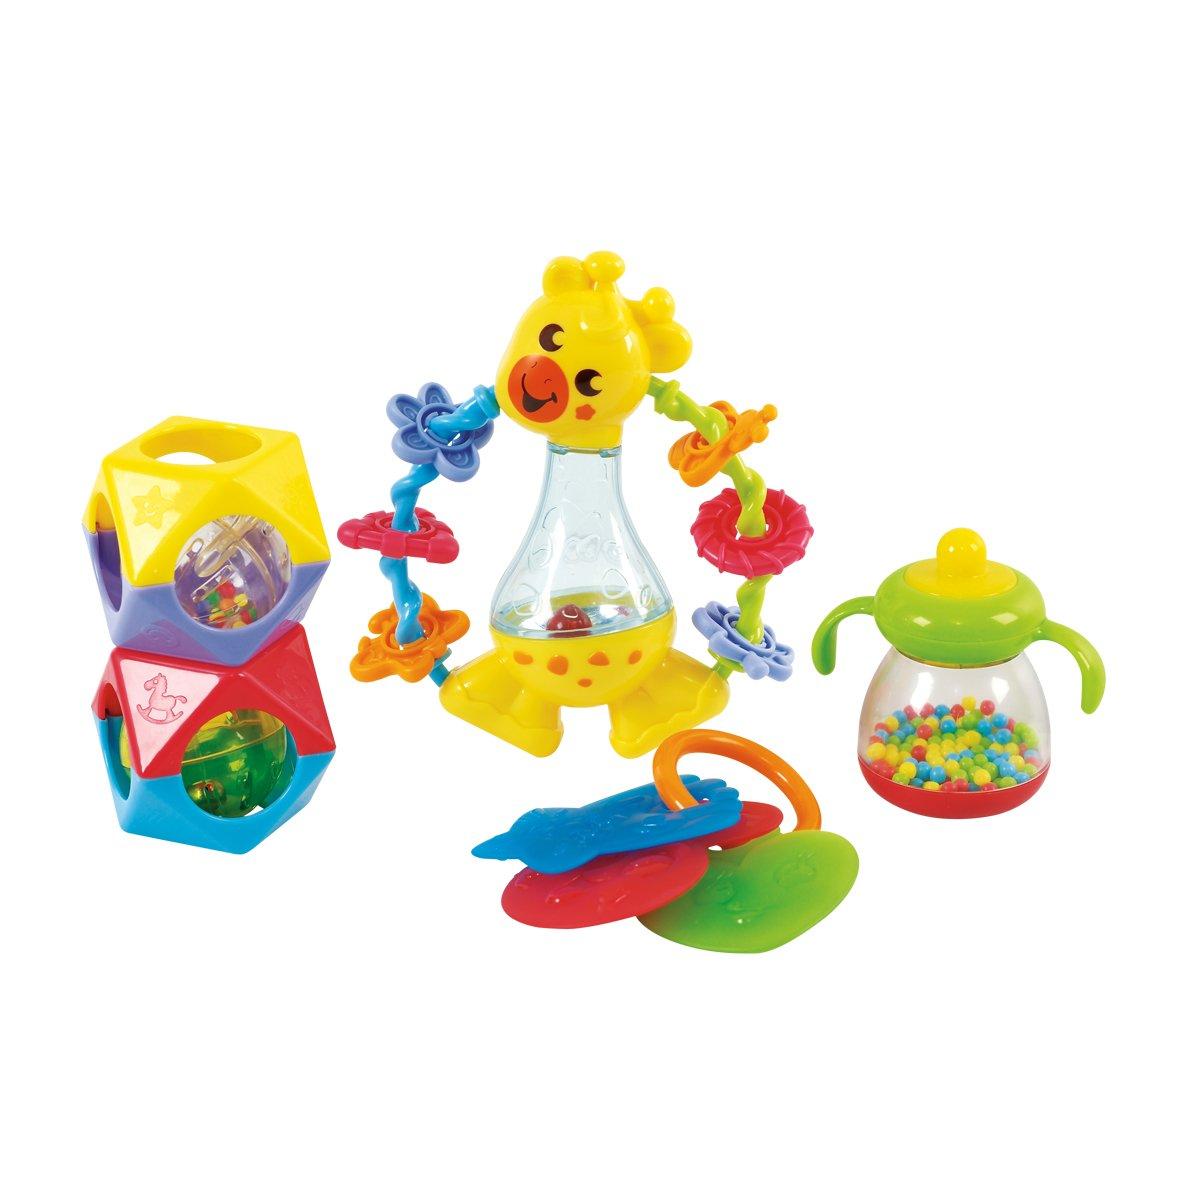 5 Piece PlayGo Rattle /& Teethe Set